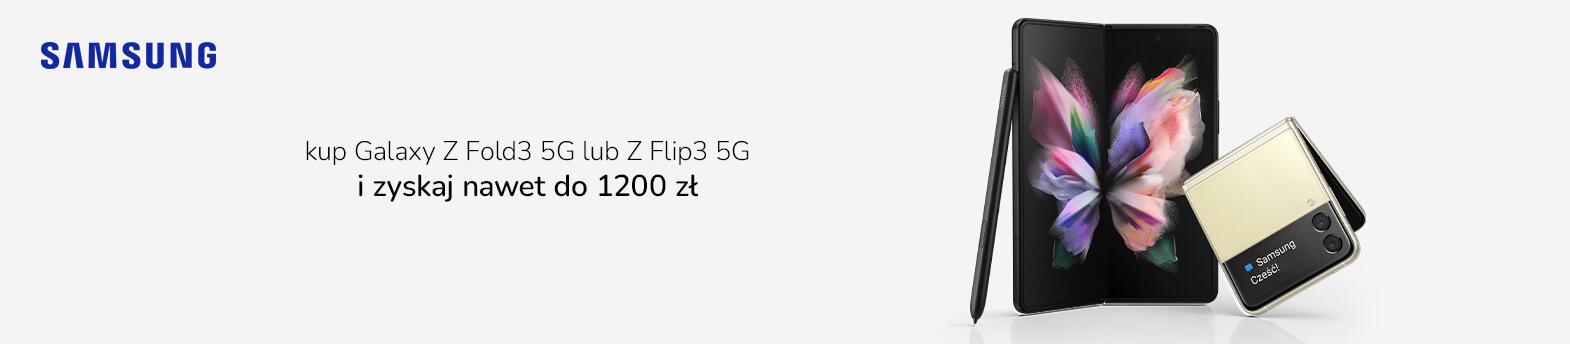 promocja Samsung Z Fold3   ZFlip3 5G